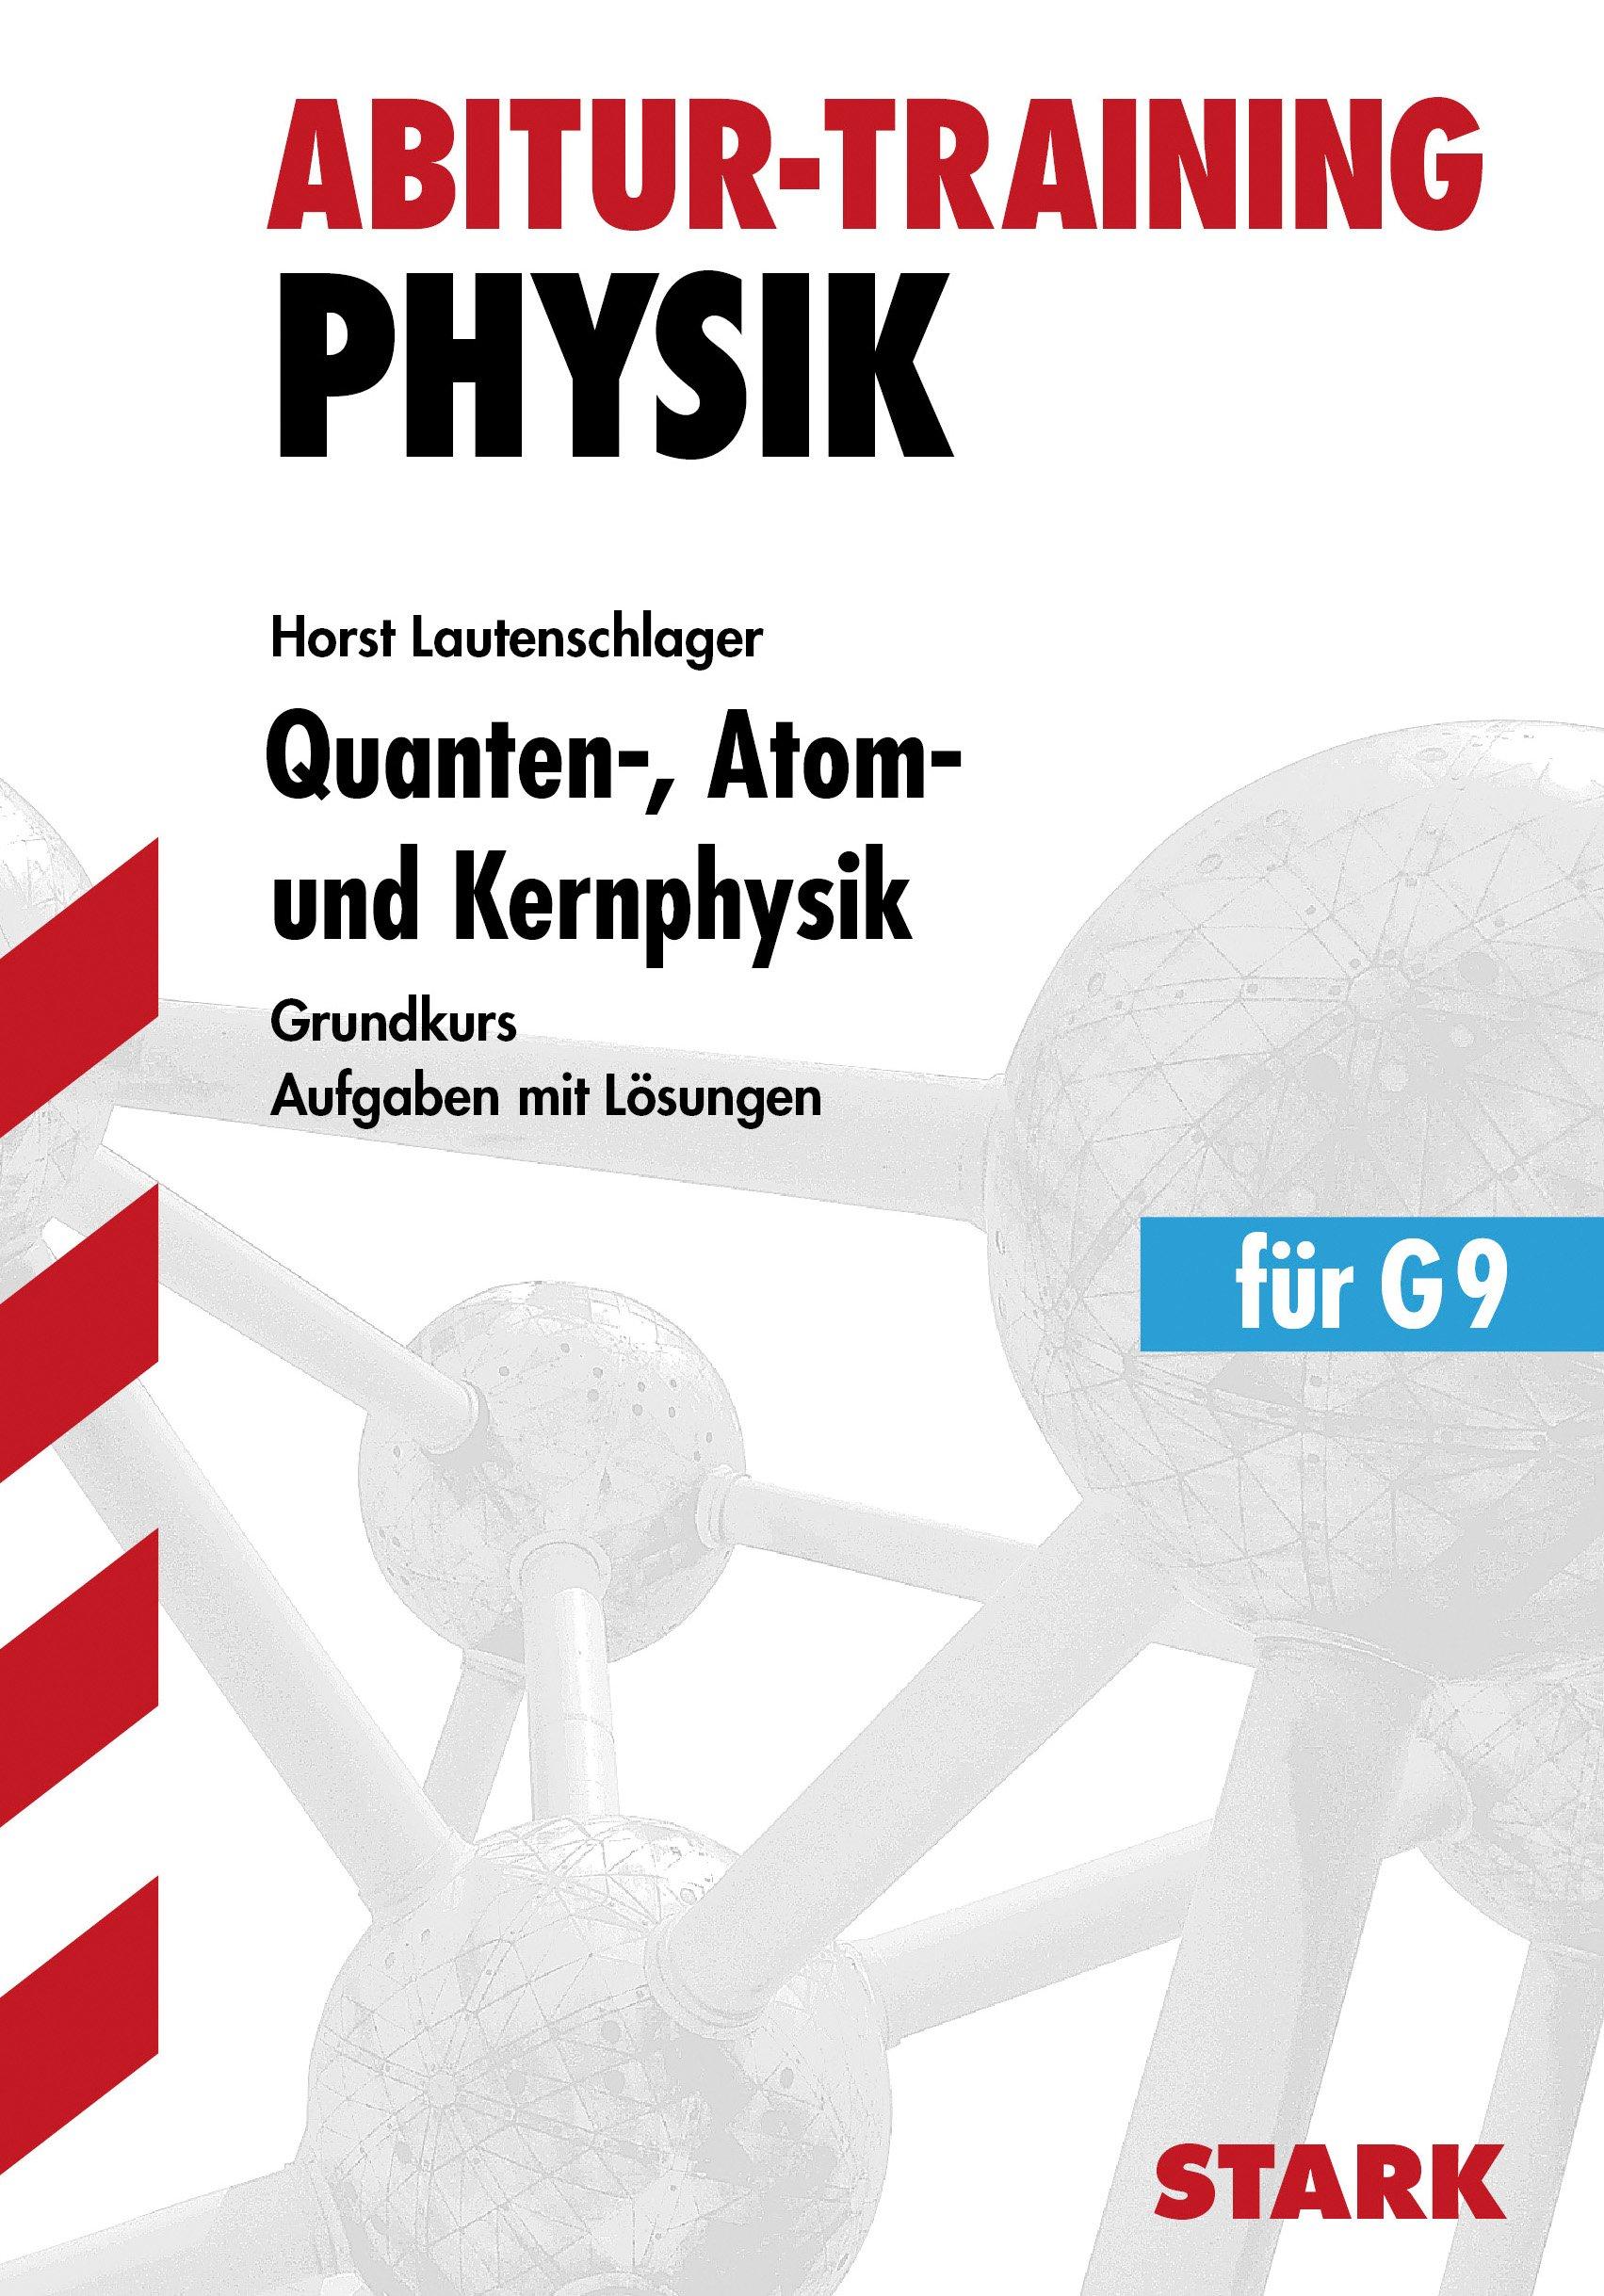 Abitur-Training - Physik Quanten-, Atom- und Kernphysik gk